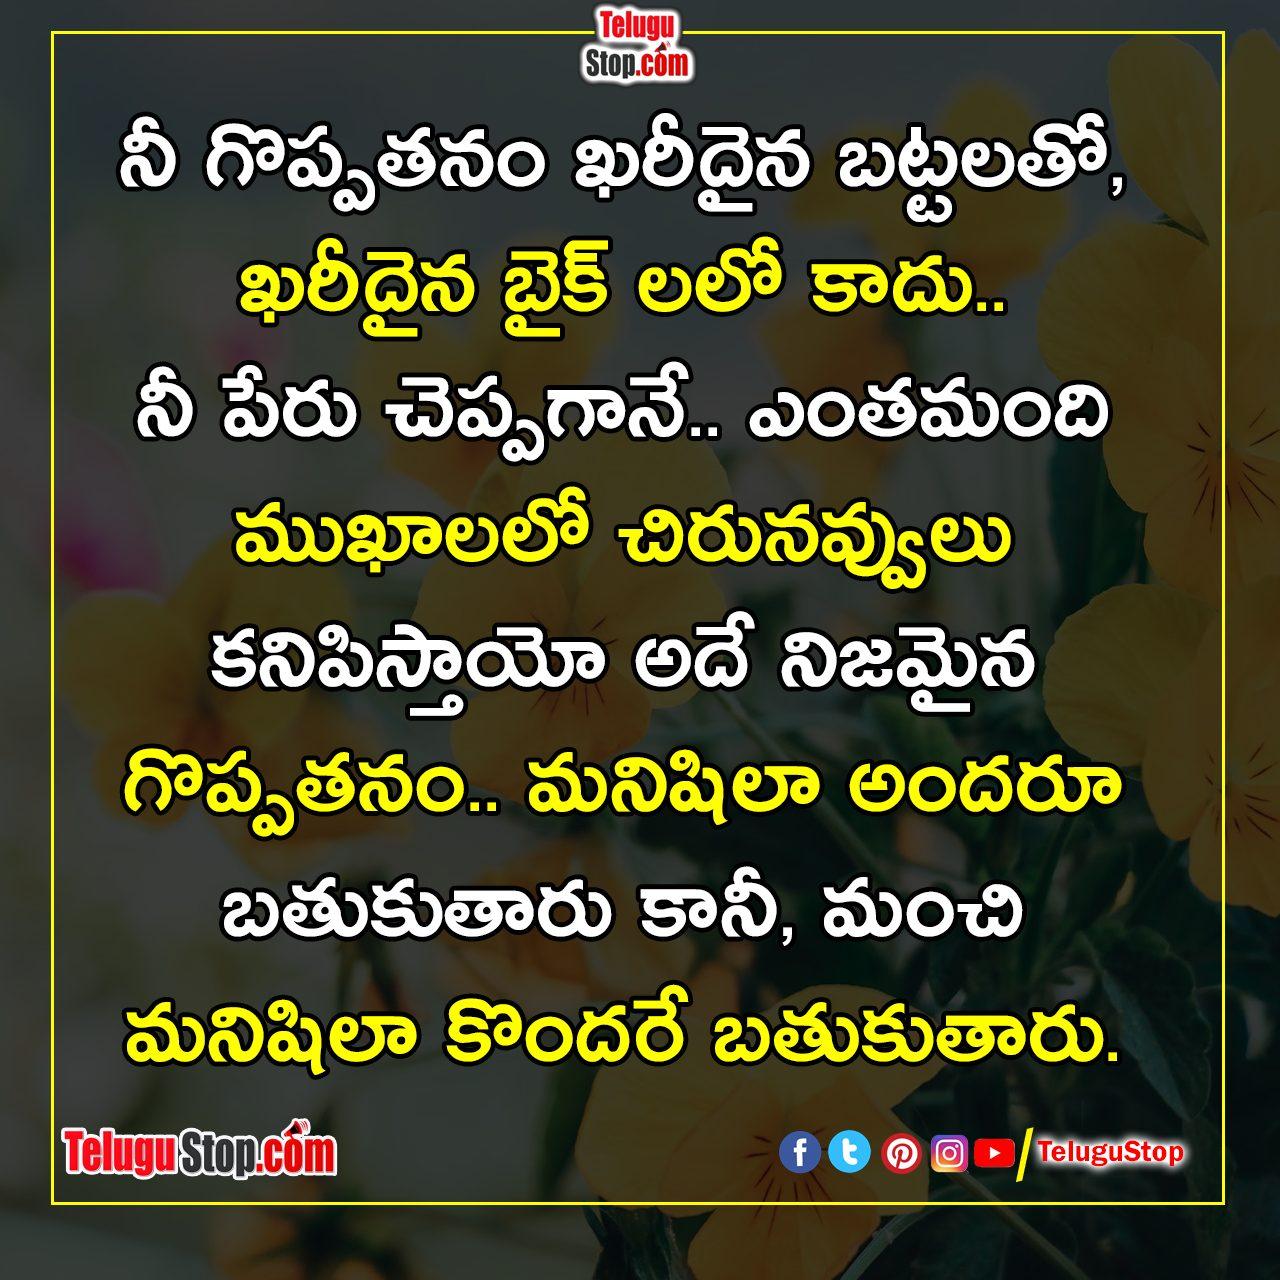 Telugu Actual Pleasure Inspirational Quotes, Believe Will Never Come Again Inspirational Quotes, Life Facts Quotes In Telugu Inspirational Quotes, There Are Few Who Are Human Inspirational Quotes-Telugu Daily Quotes - Inspirational/Motivational/Love/Friendship/Good Morning Quote